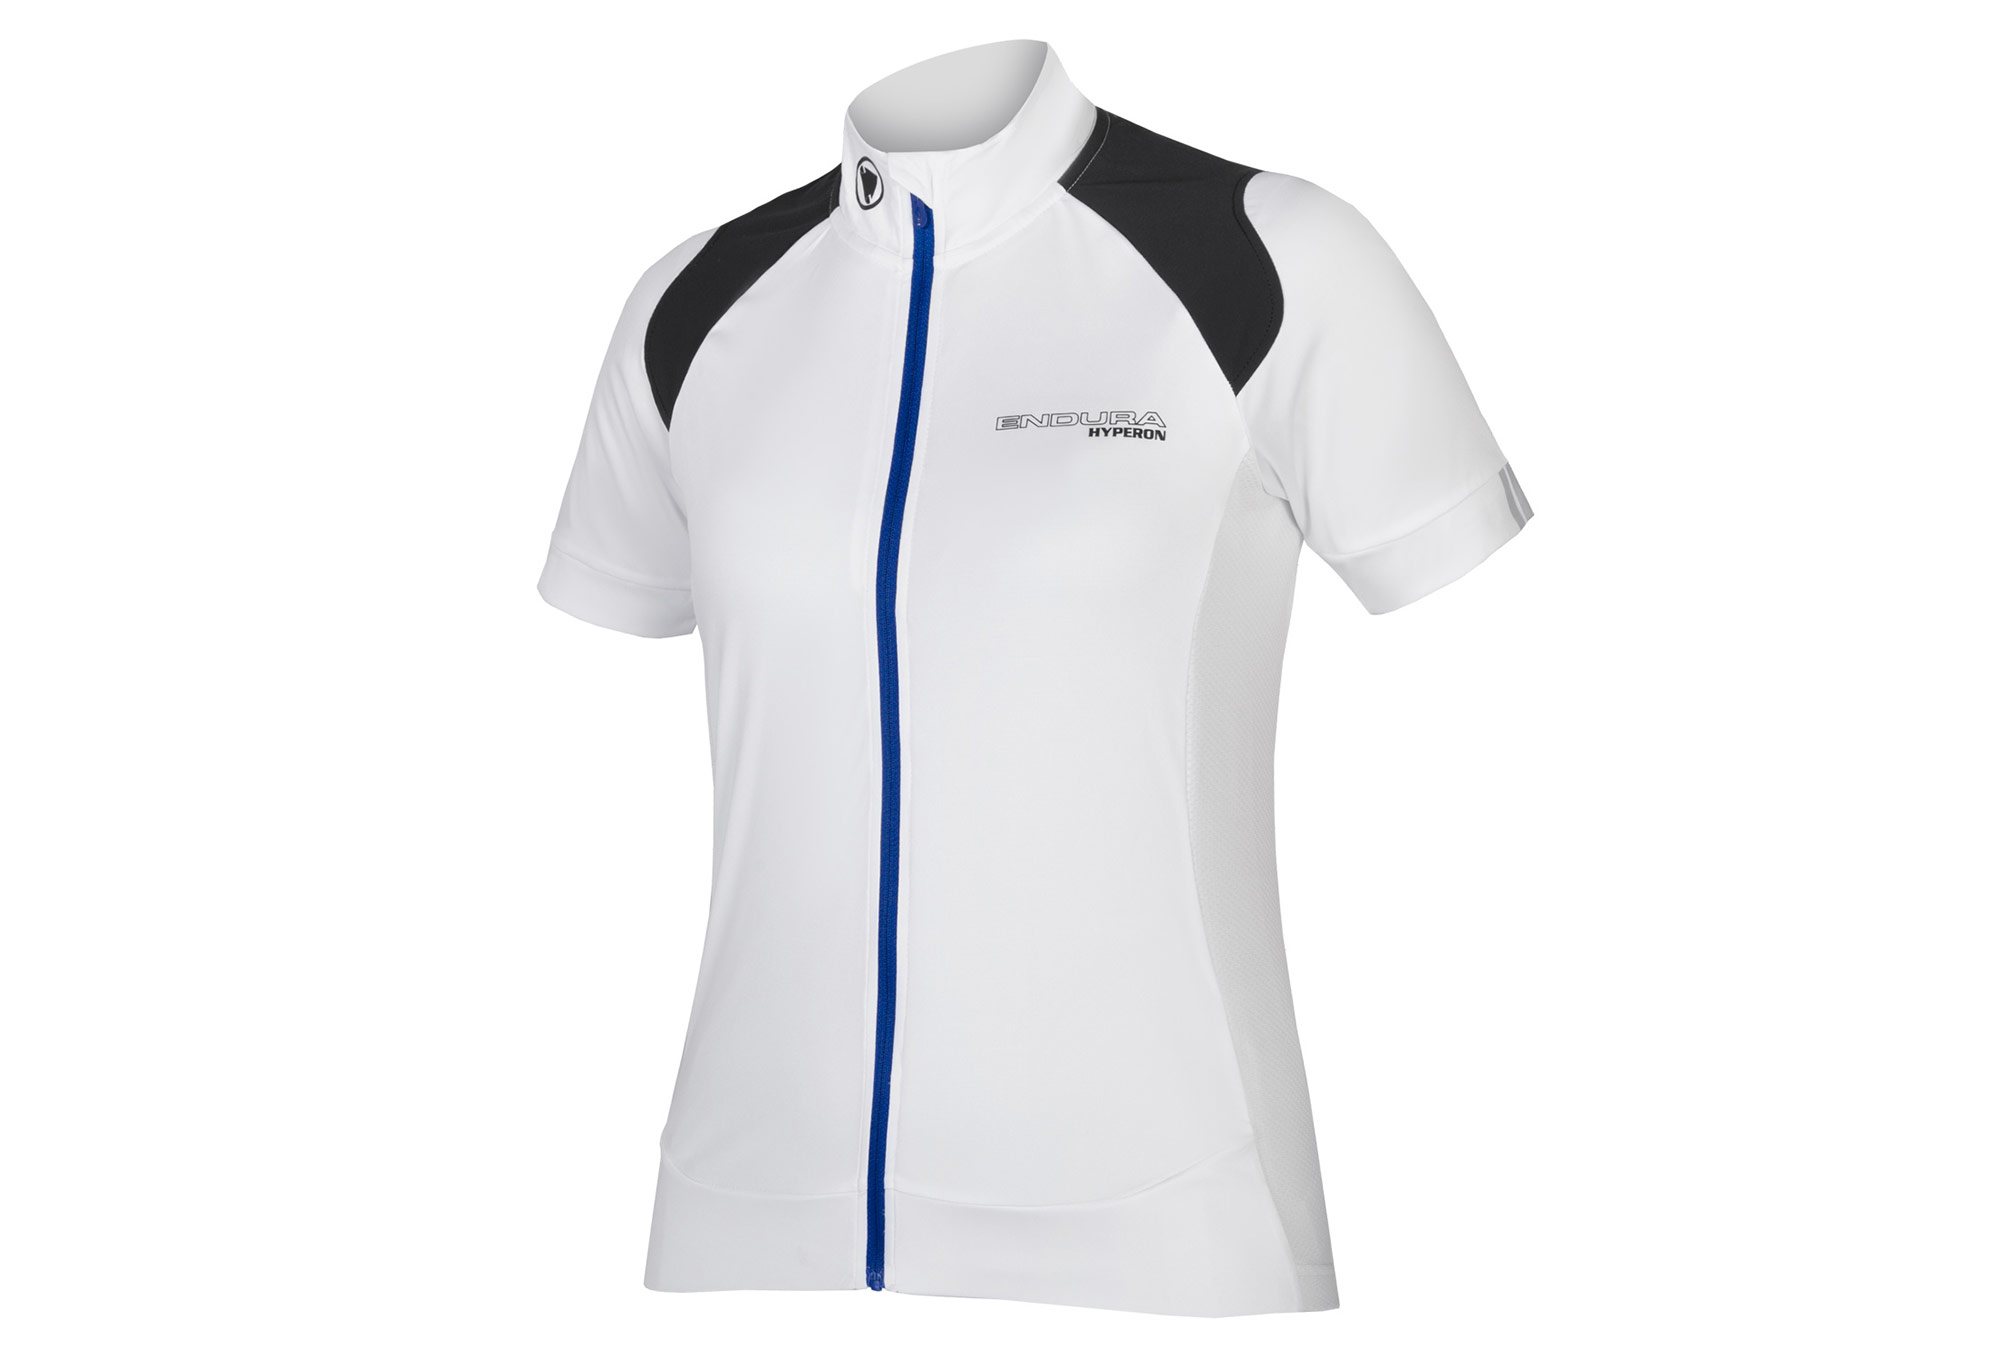 Endura Hyperon Women Short Sleeve Jersey White Blue  4b542163c